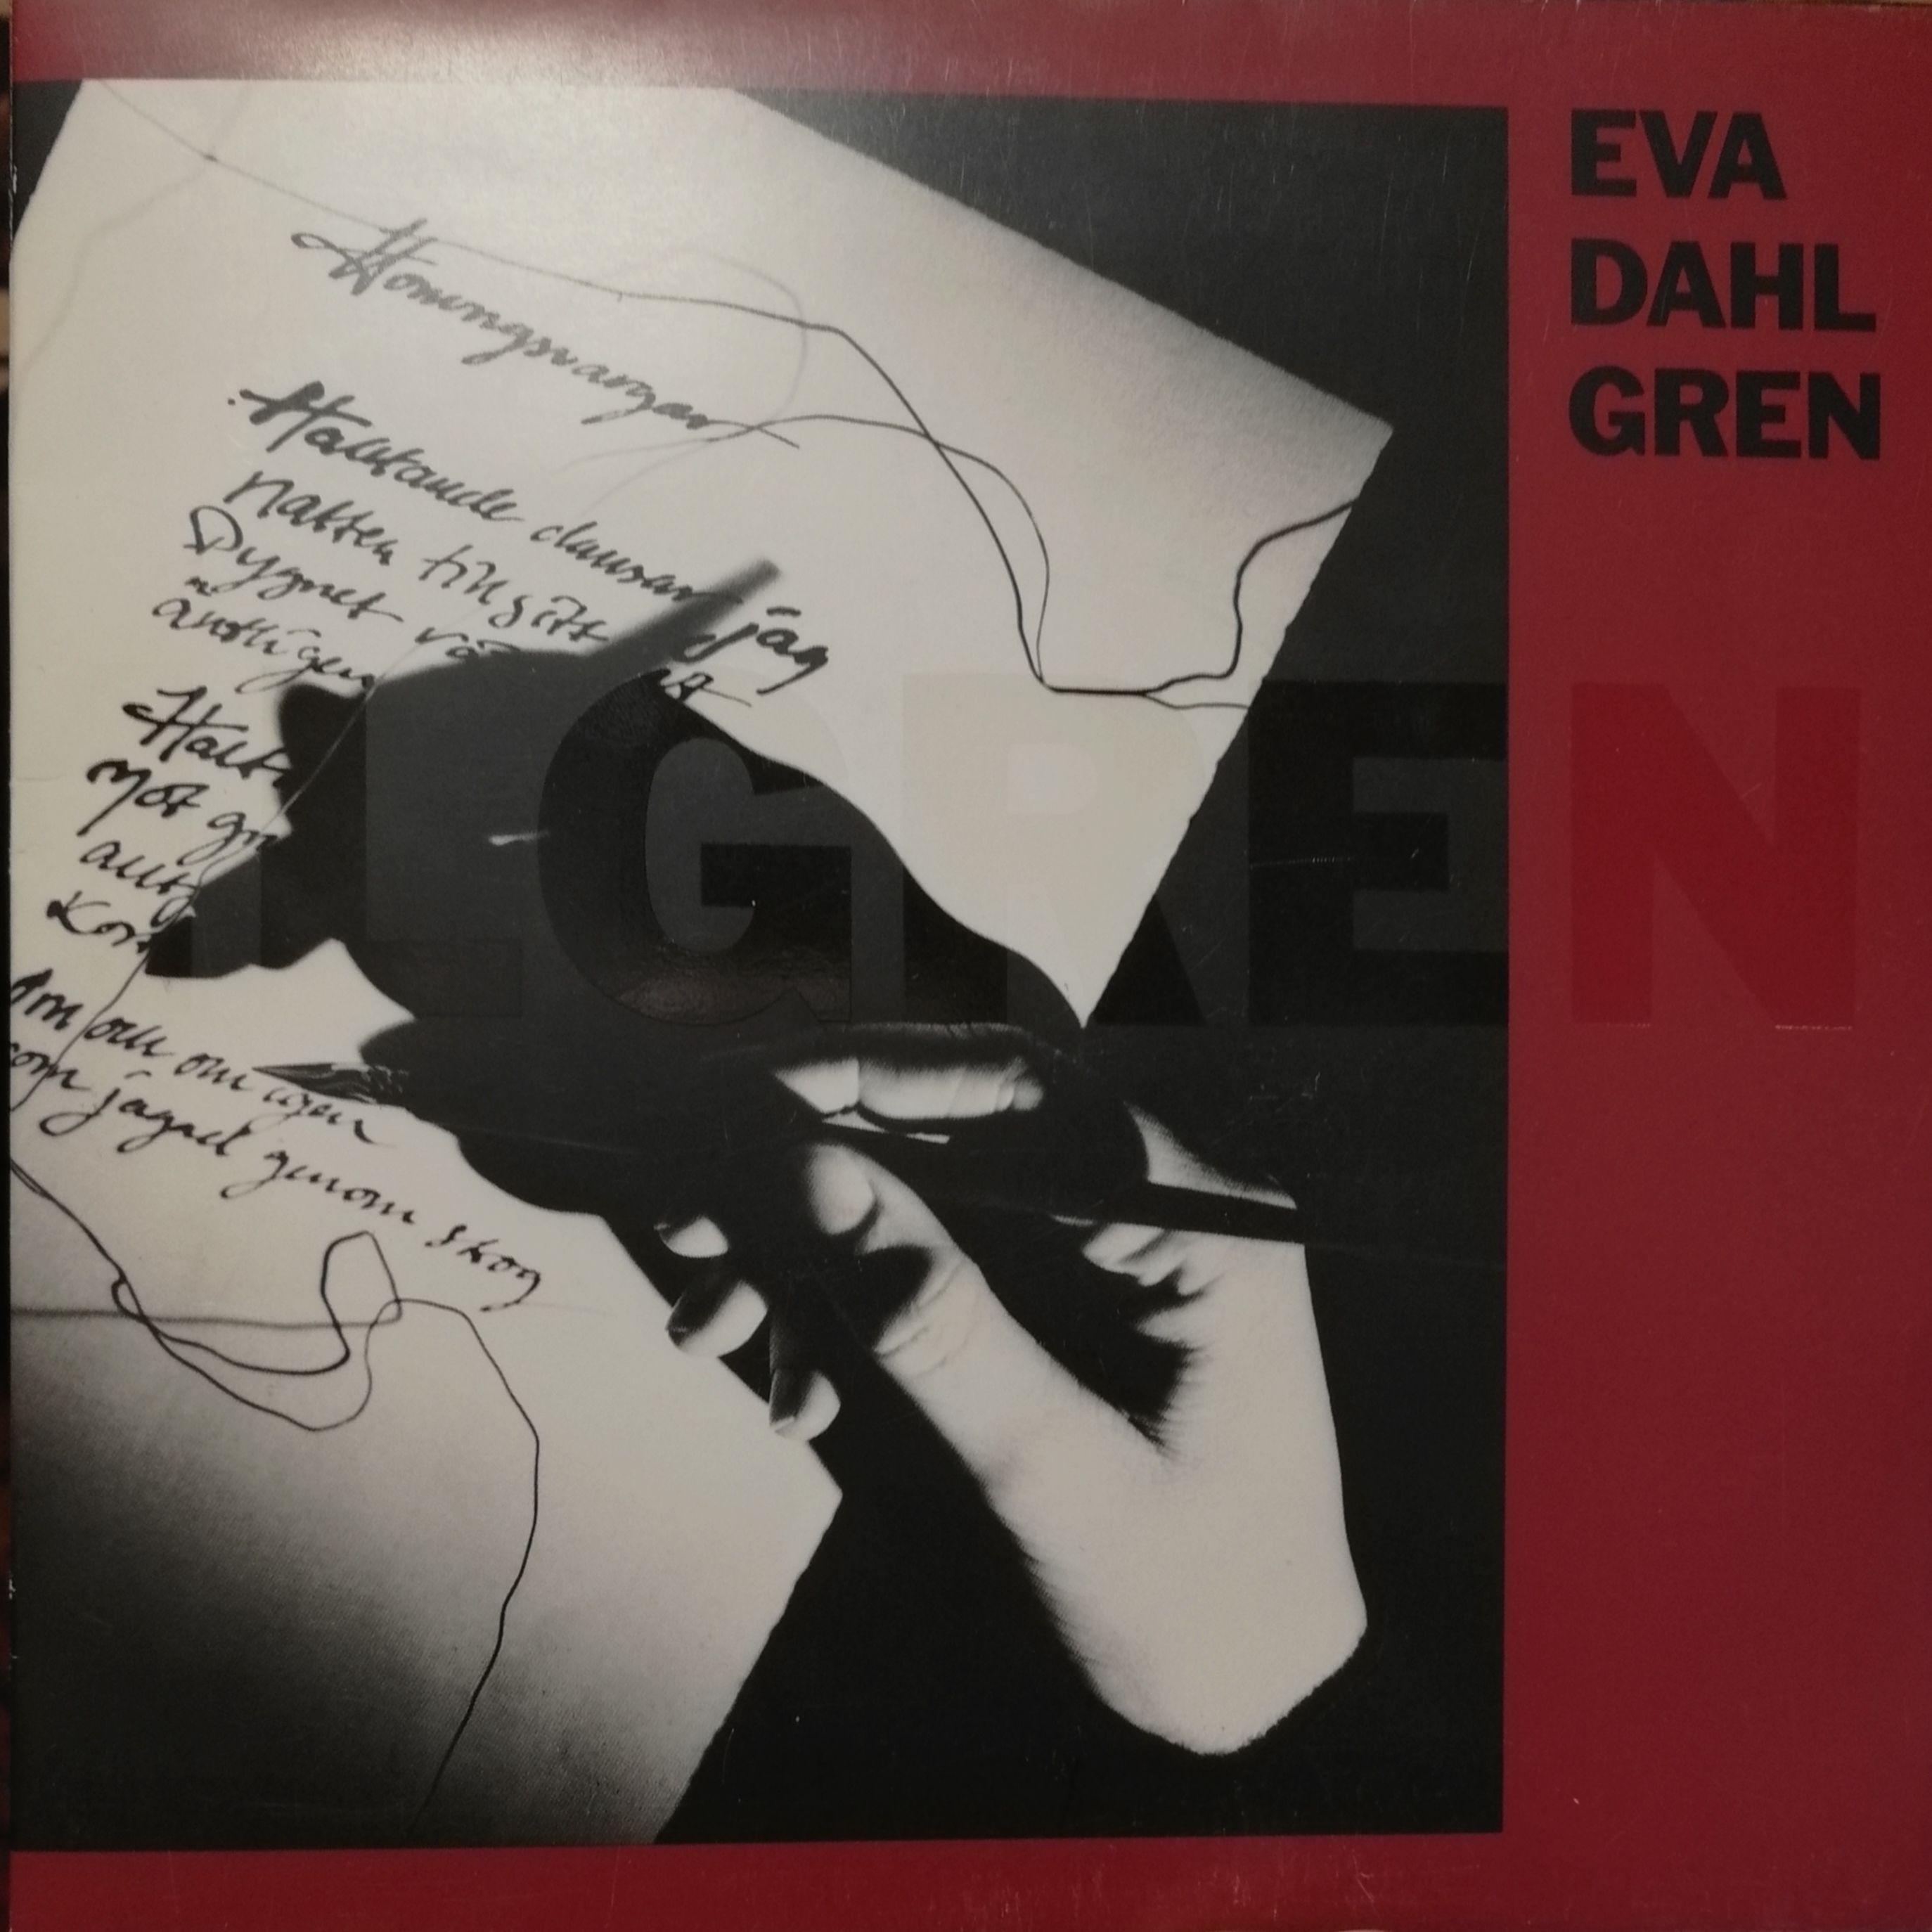 Eva Dahlgren Honungsvargar LP undefined